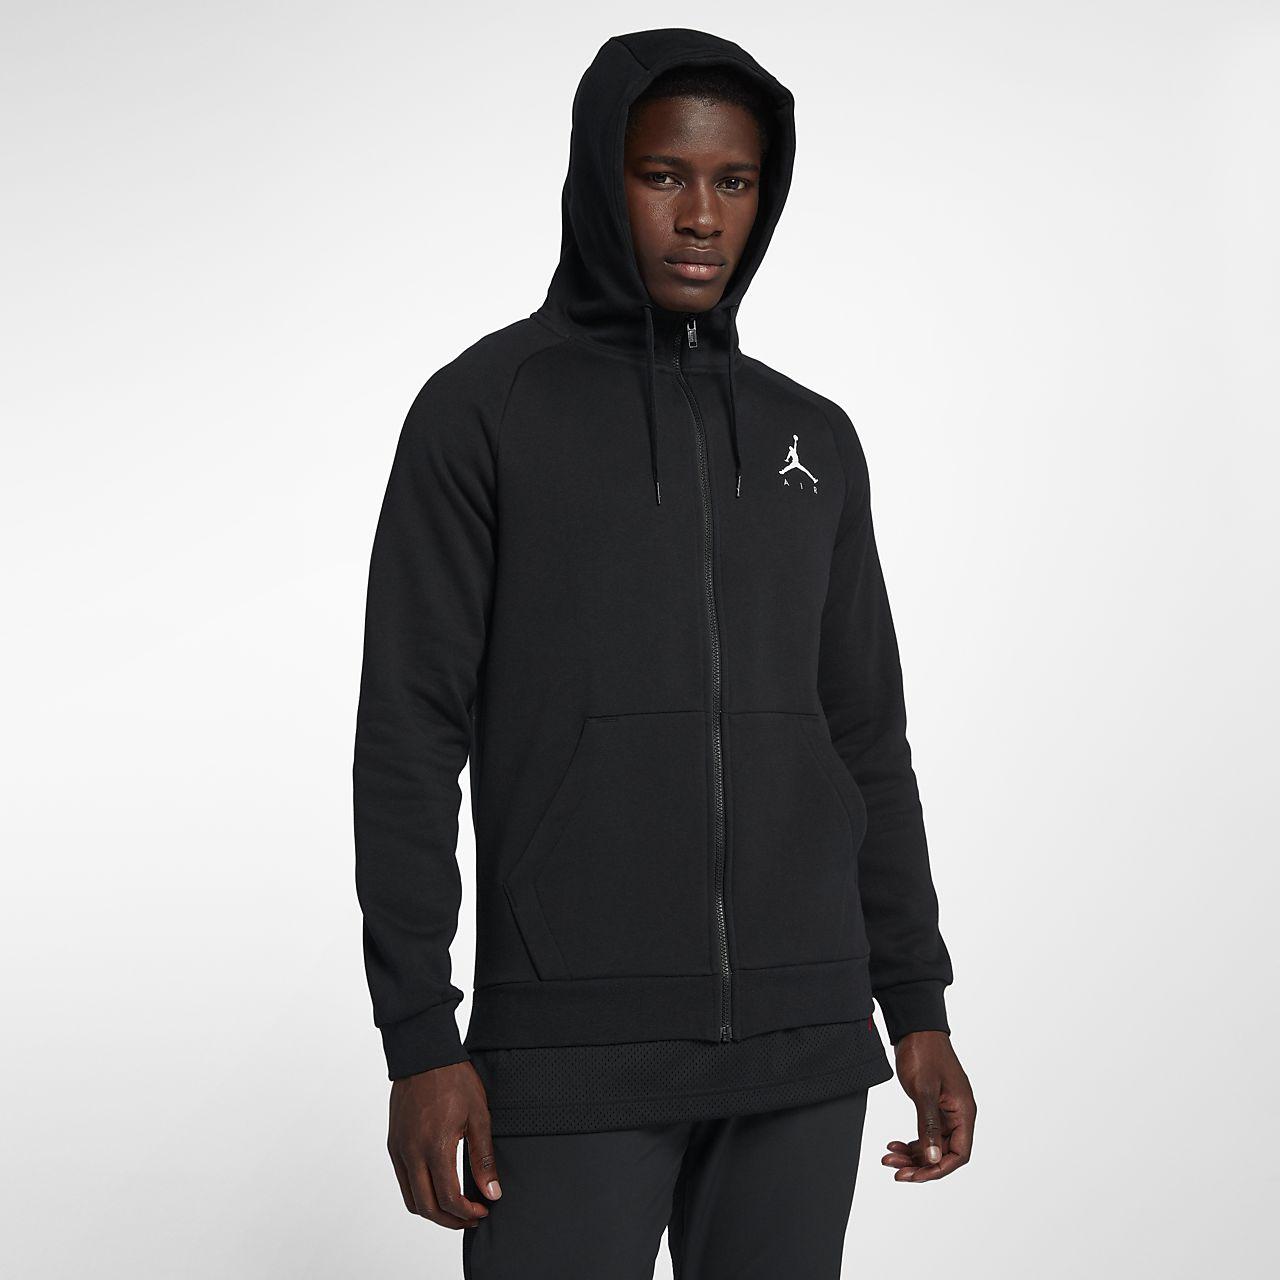 Hoodie de lã cardada com fecho completo Jordan Jumpman para homem